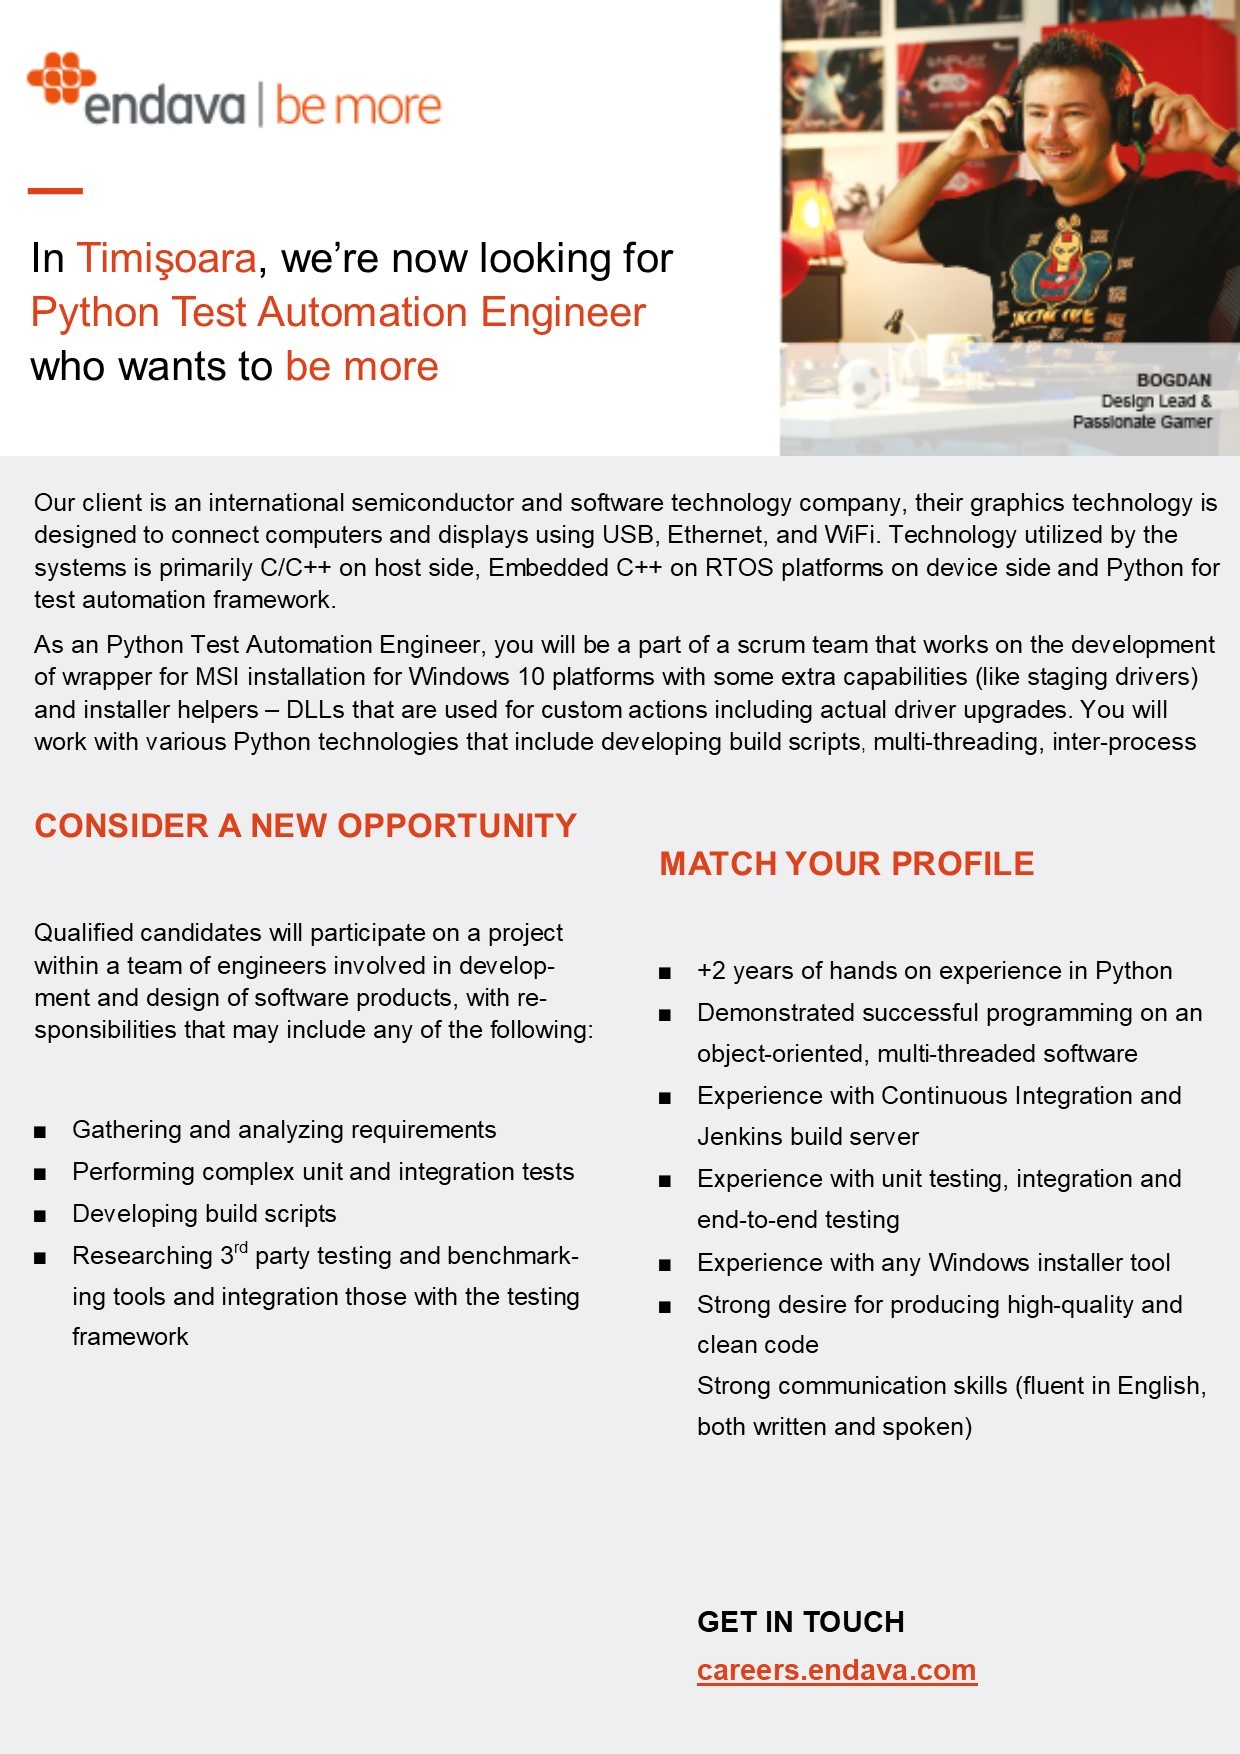 Python Test Automation Engineer